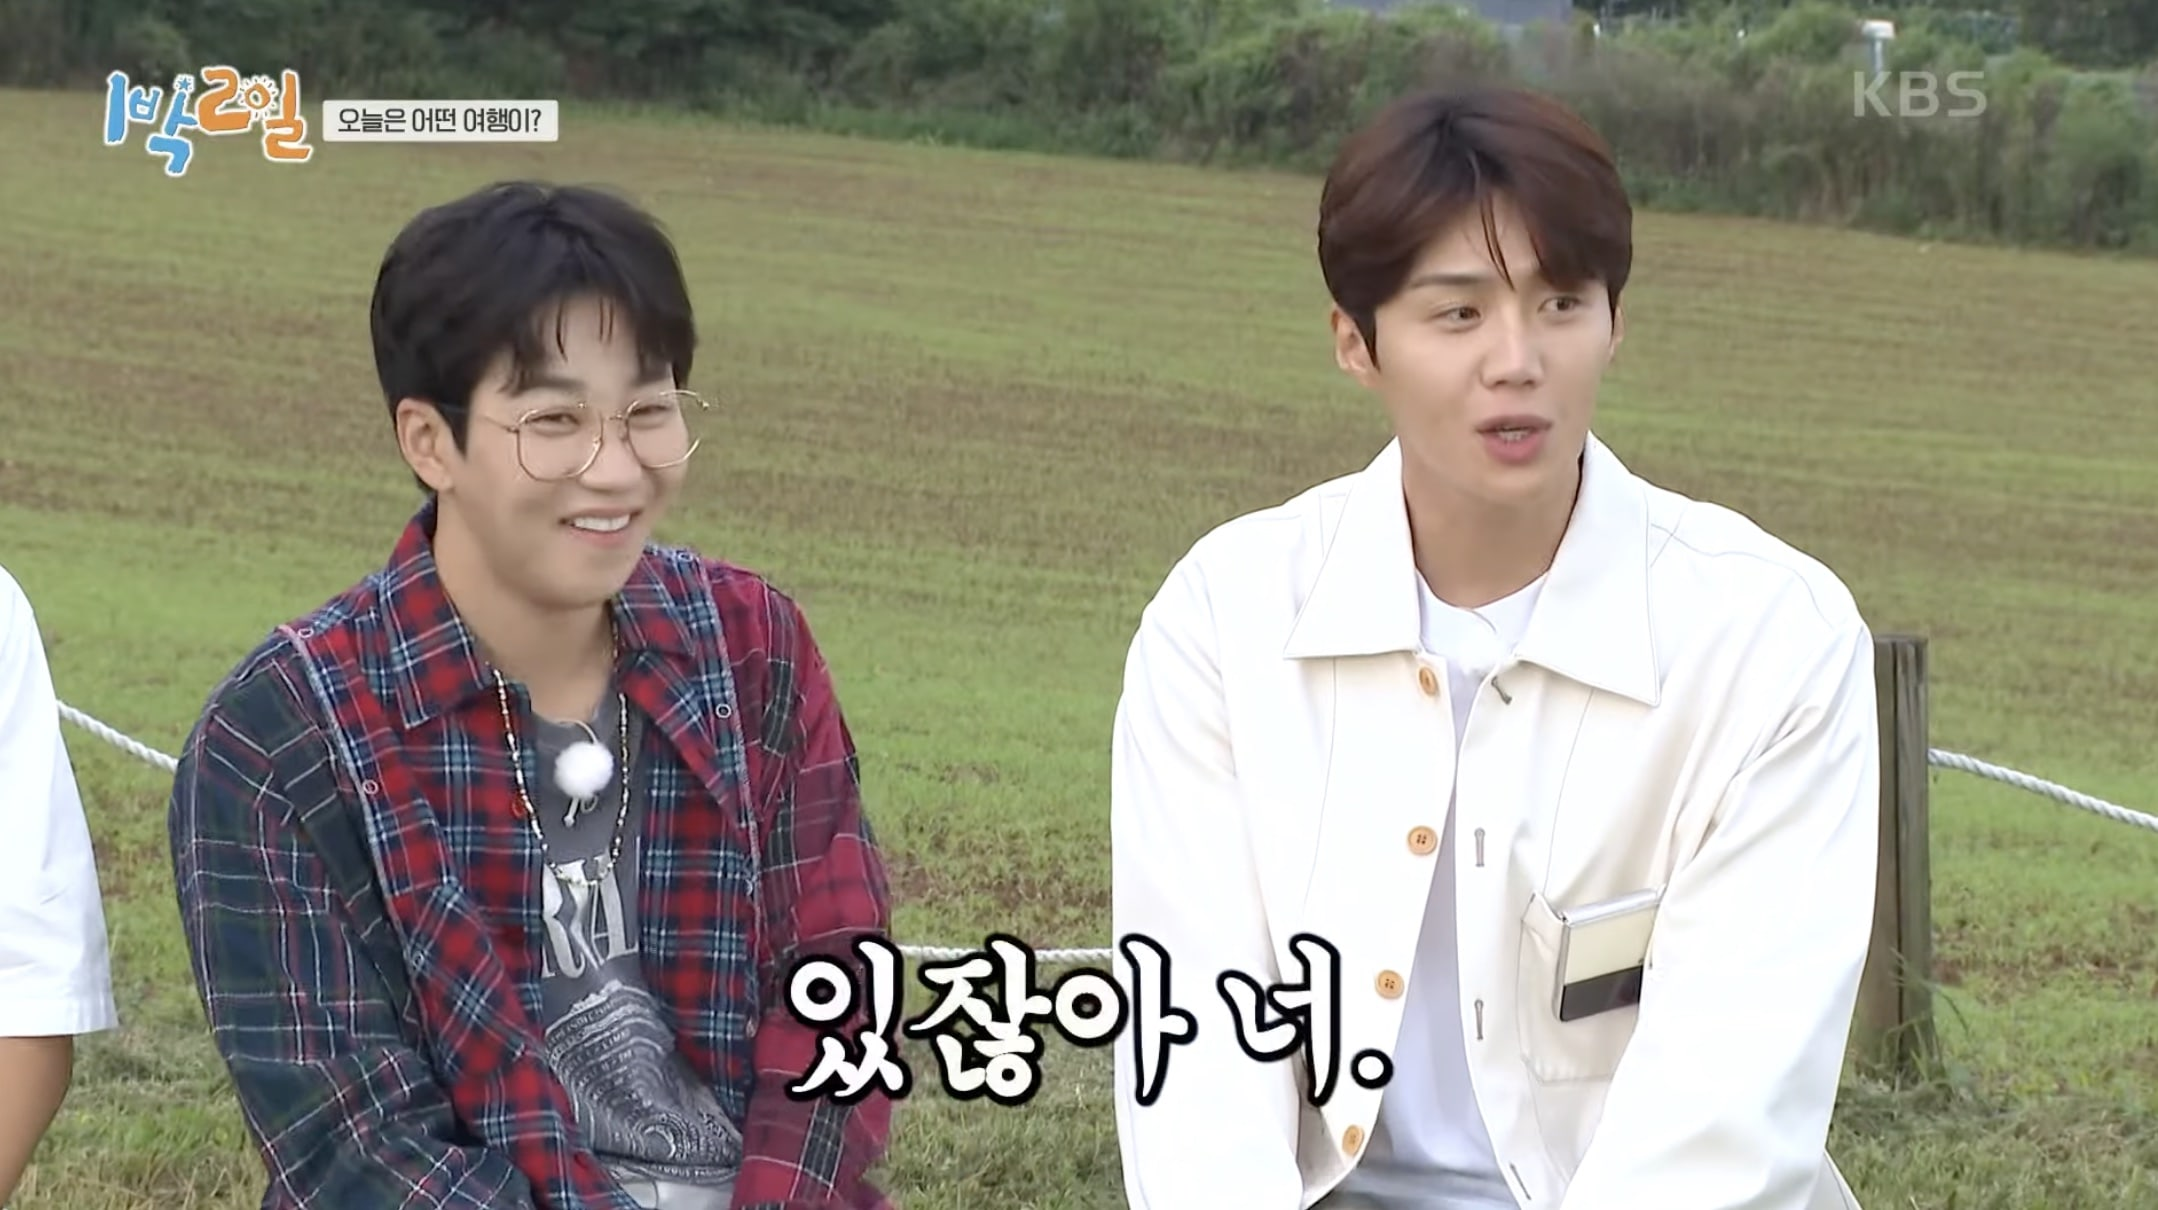 kim-seon-ho-dindin-2